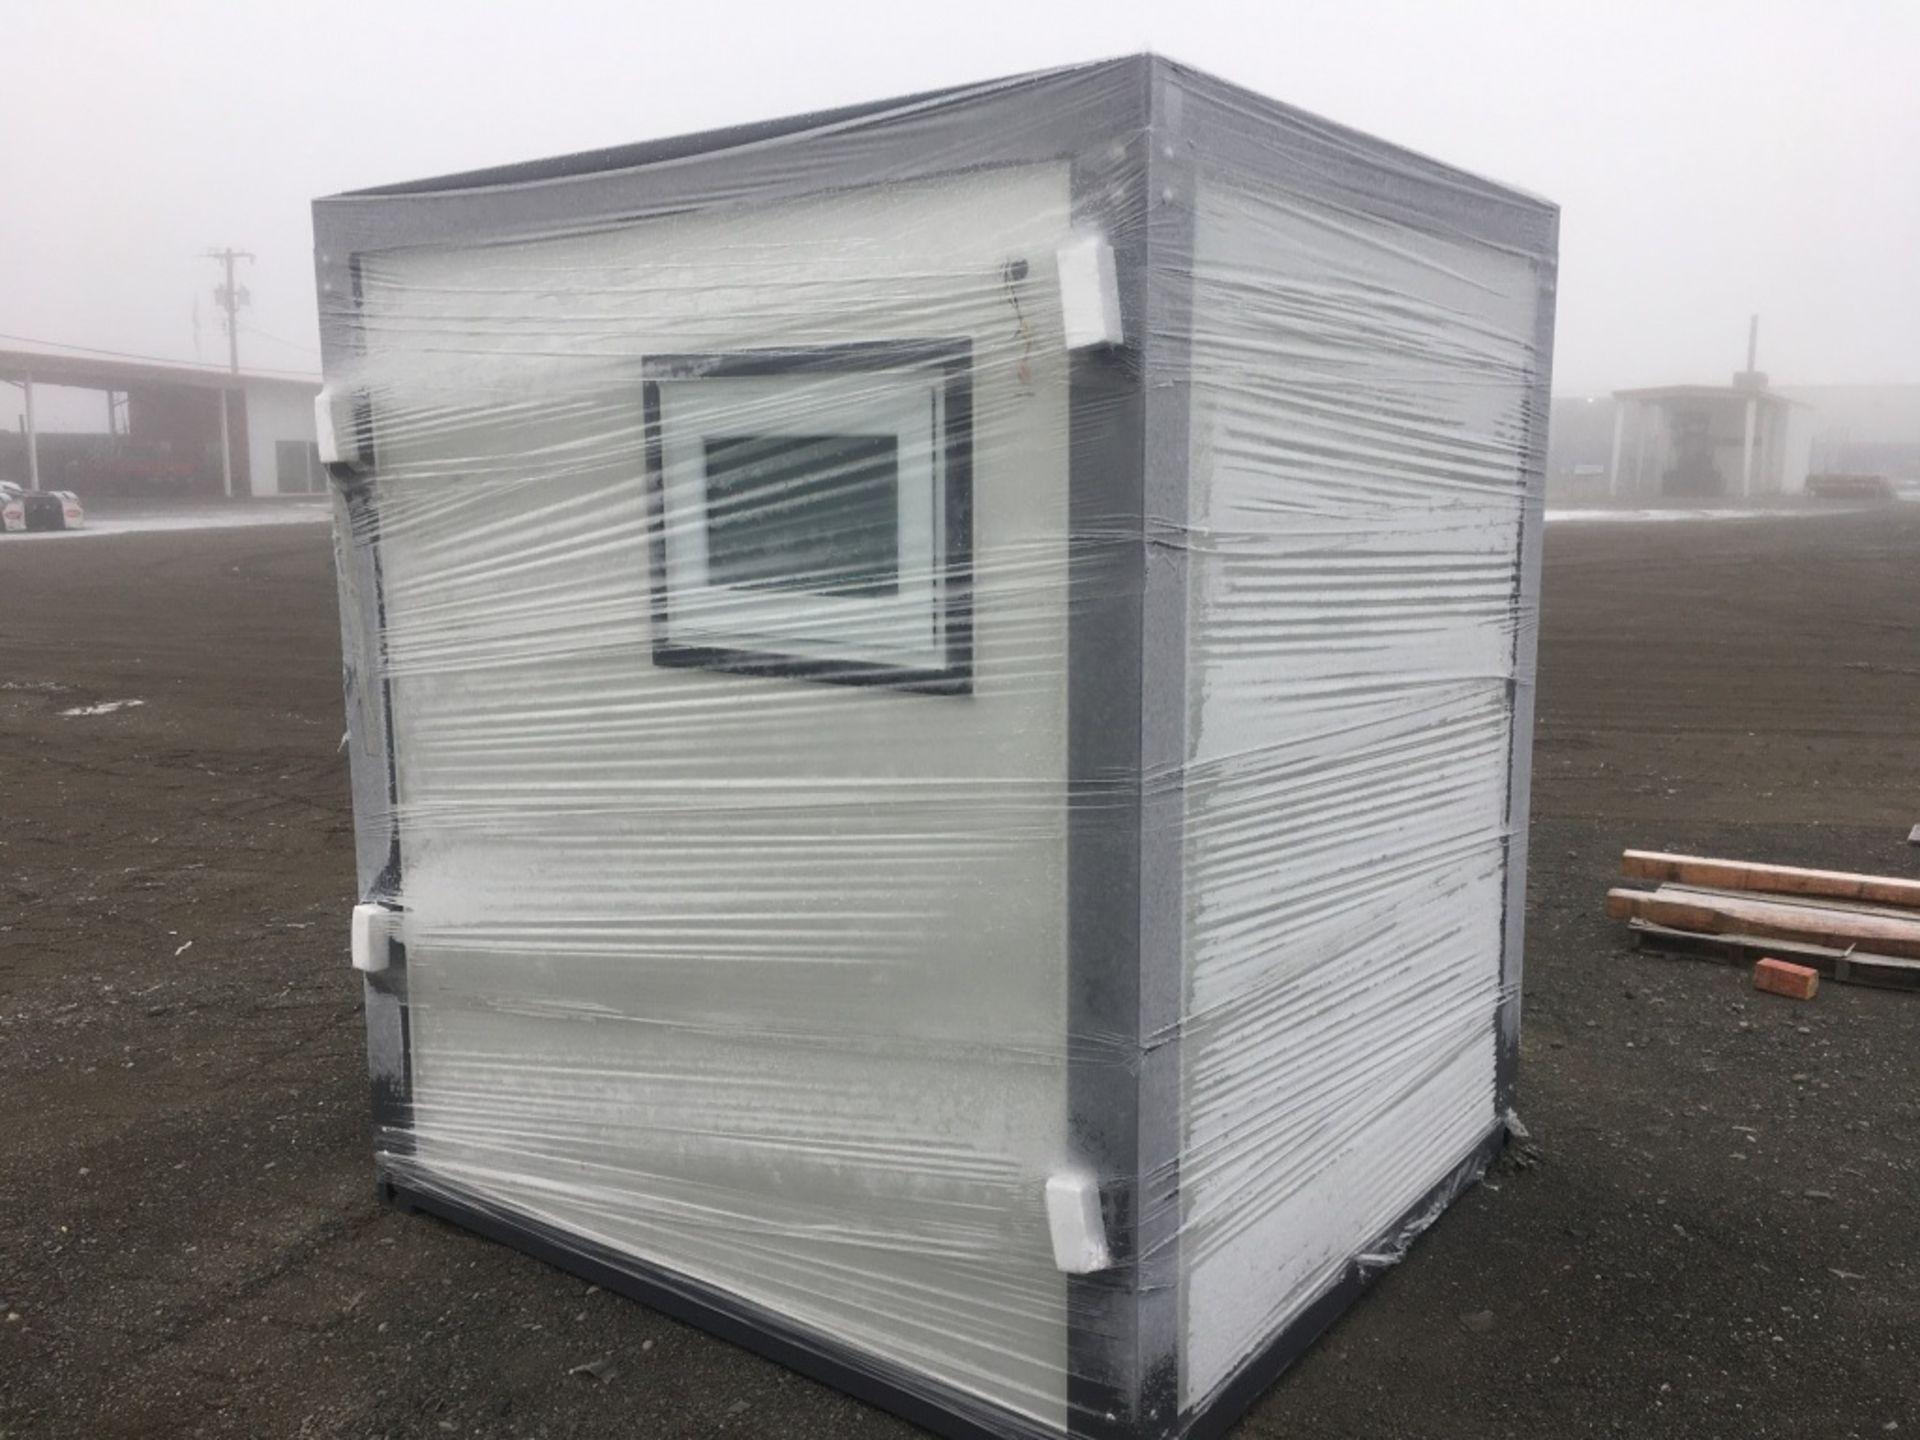 2020 Bastone Portable Restroom w/Shower - Image 4 of 5